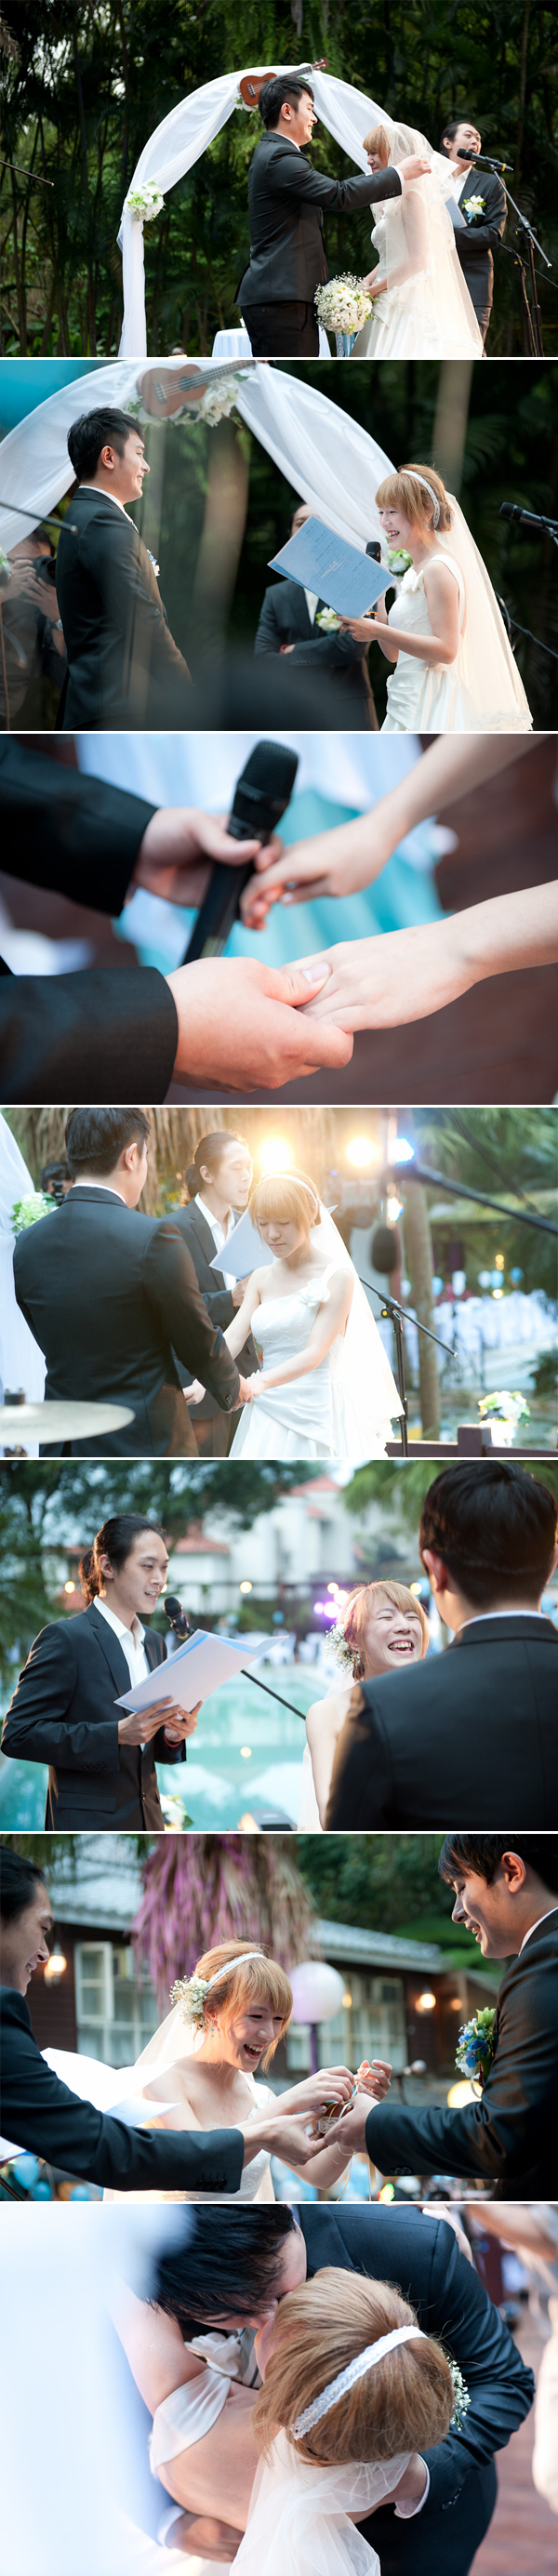 lego-white-wedding02b